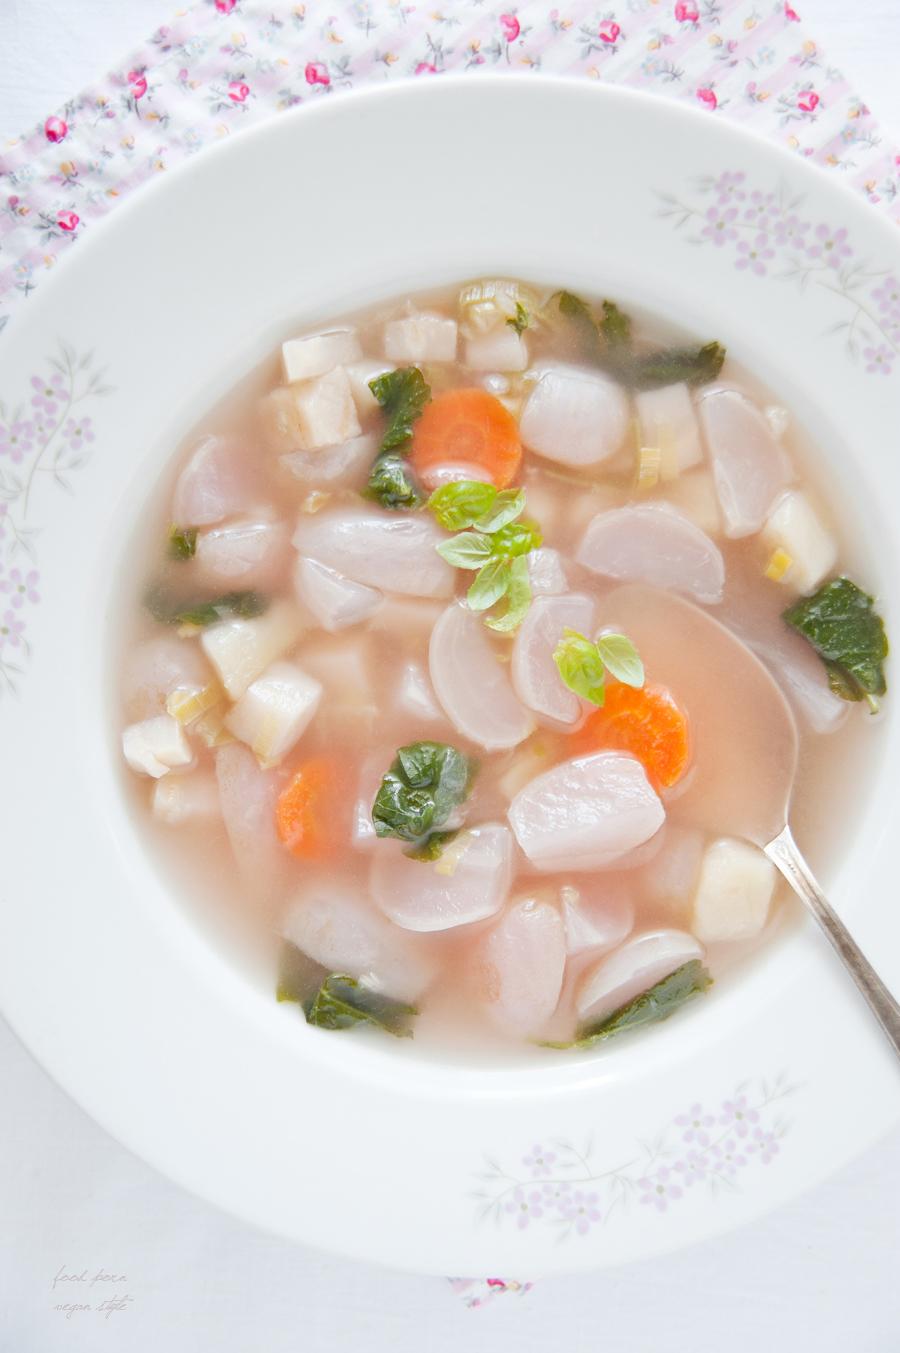 Radish soup